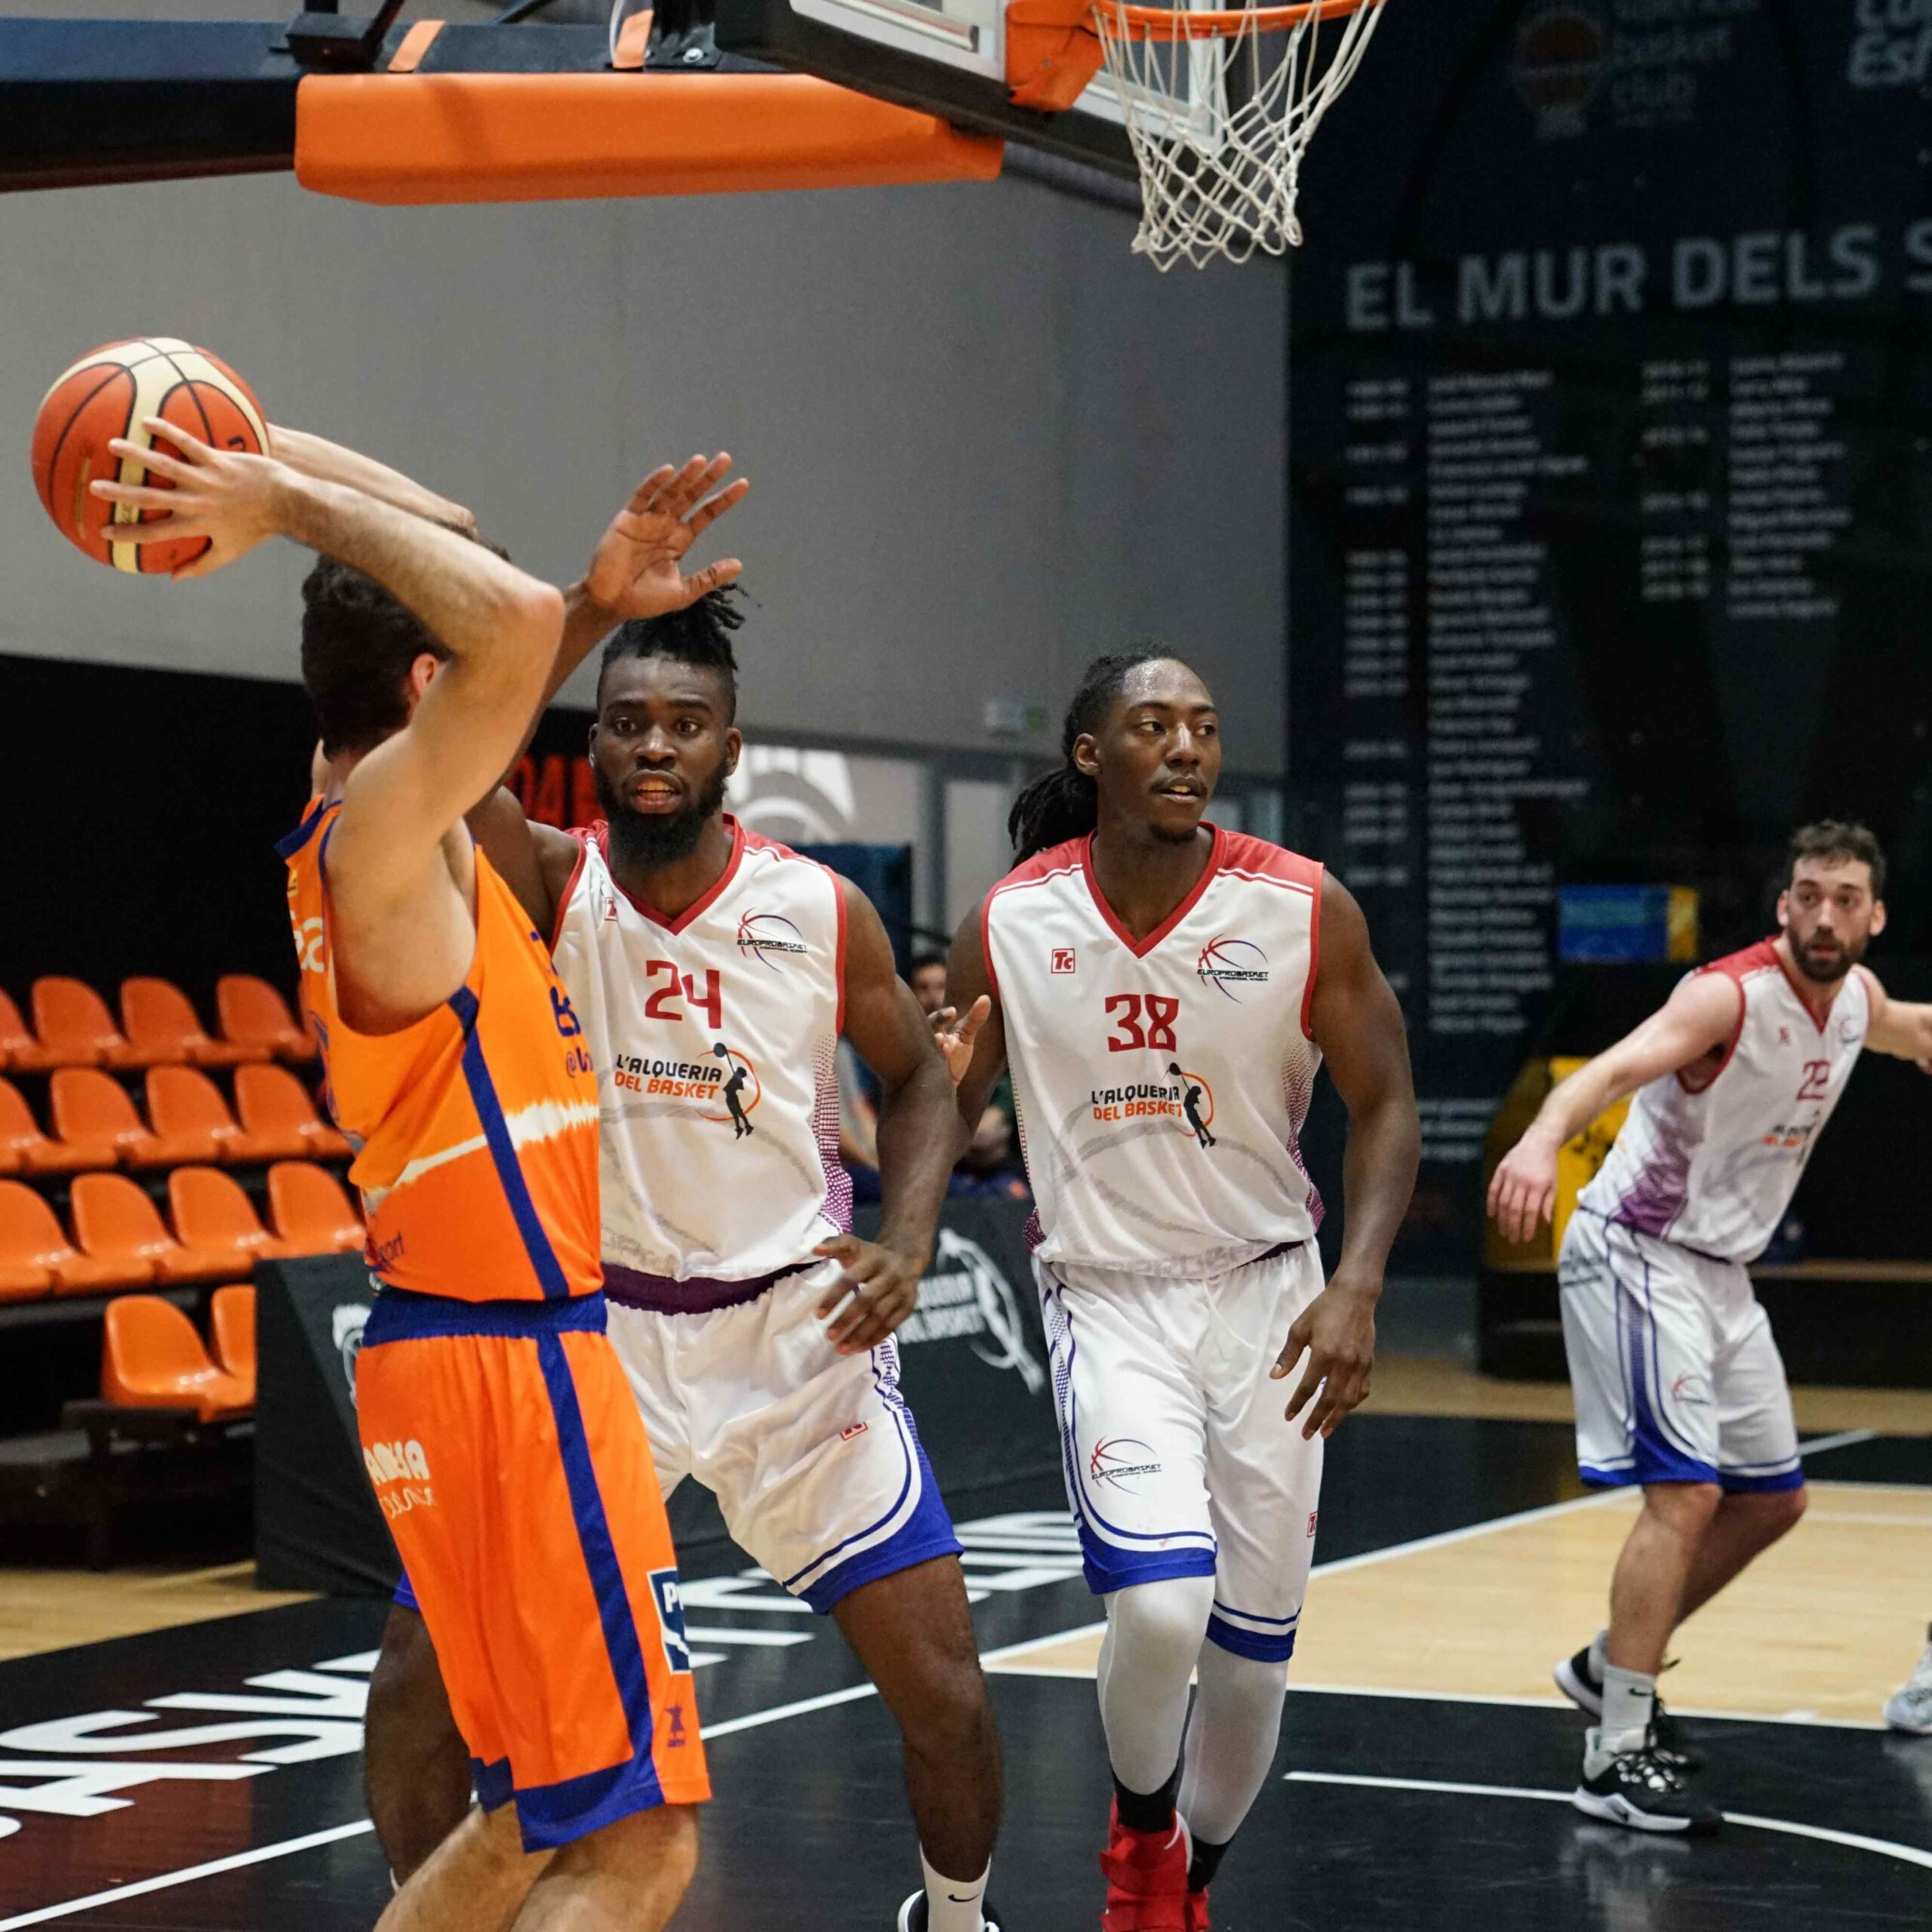 Ronnie Tyson Europrobasket